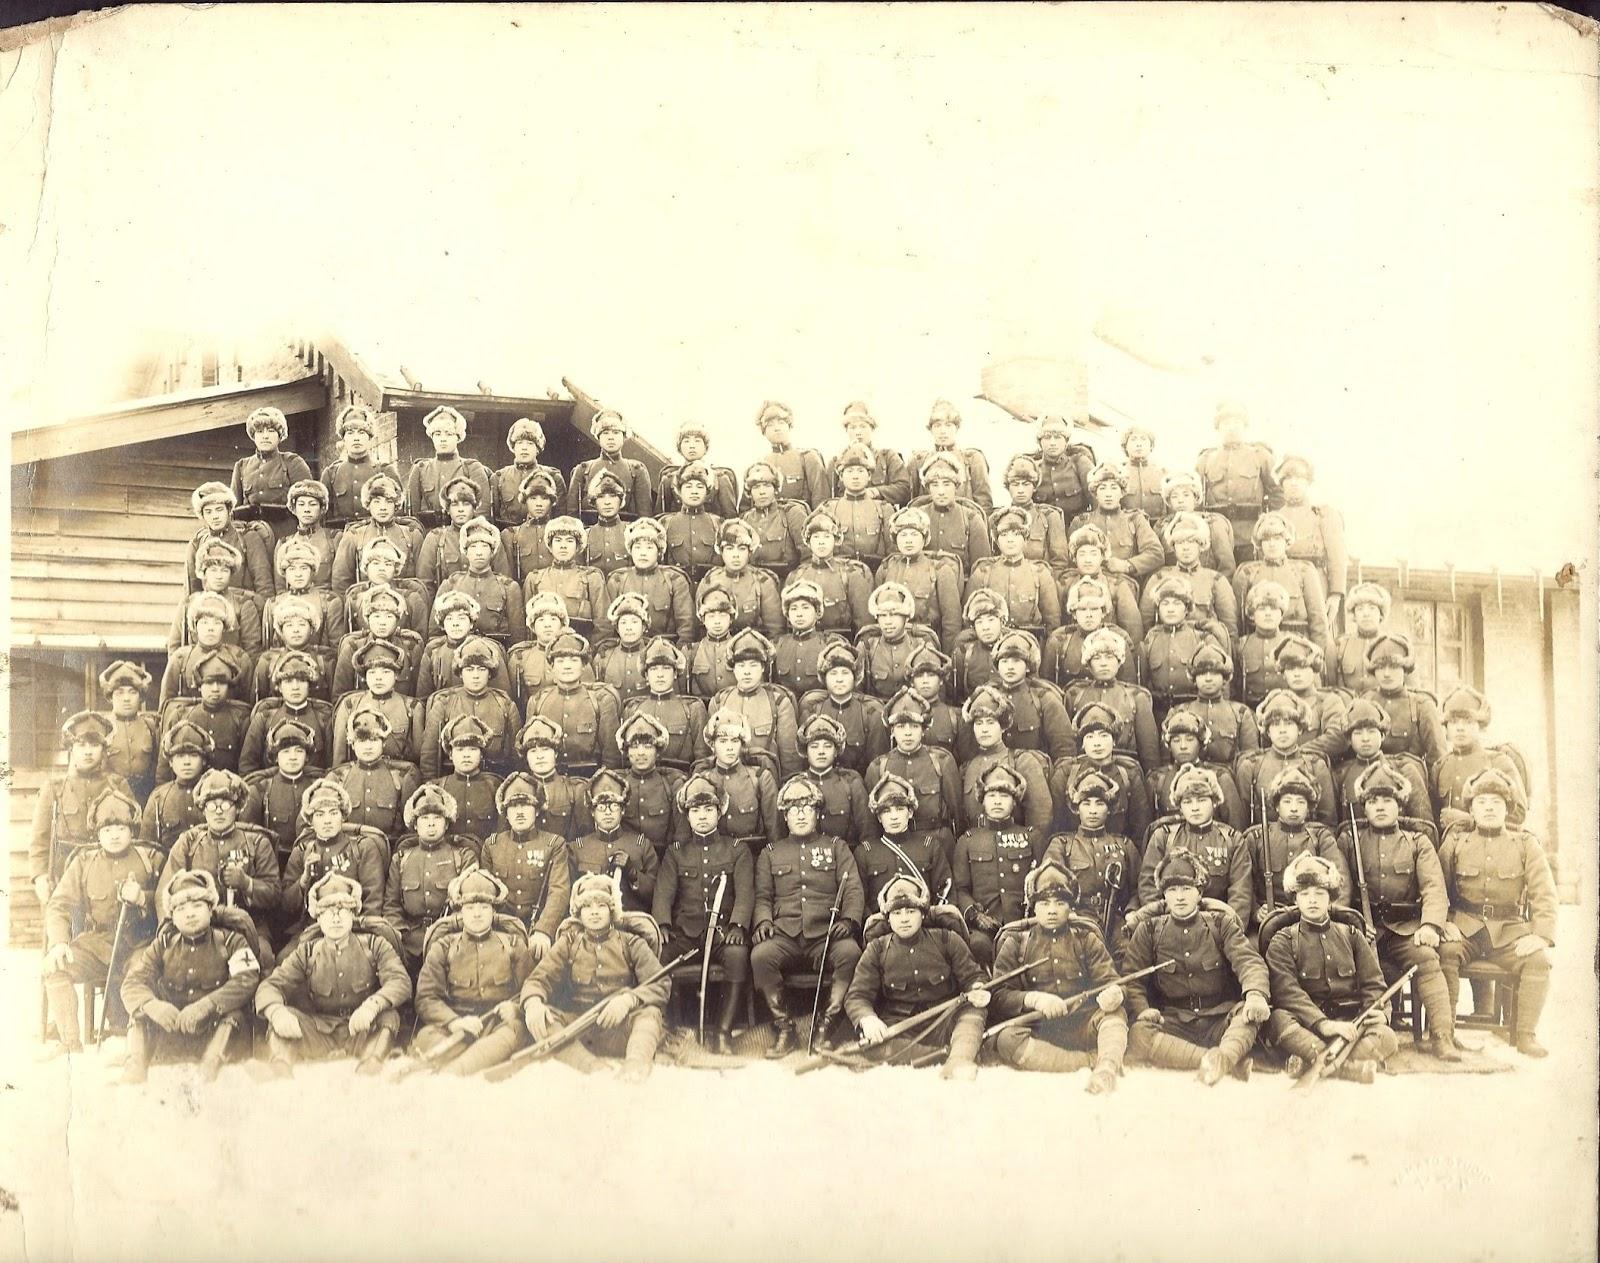 Japan It 39 s A Wonderful Rife Pre World War II Combat Army Photo